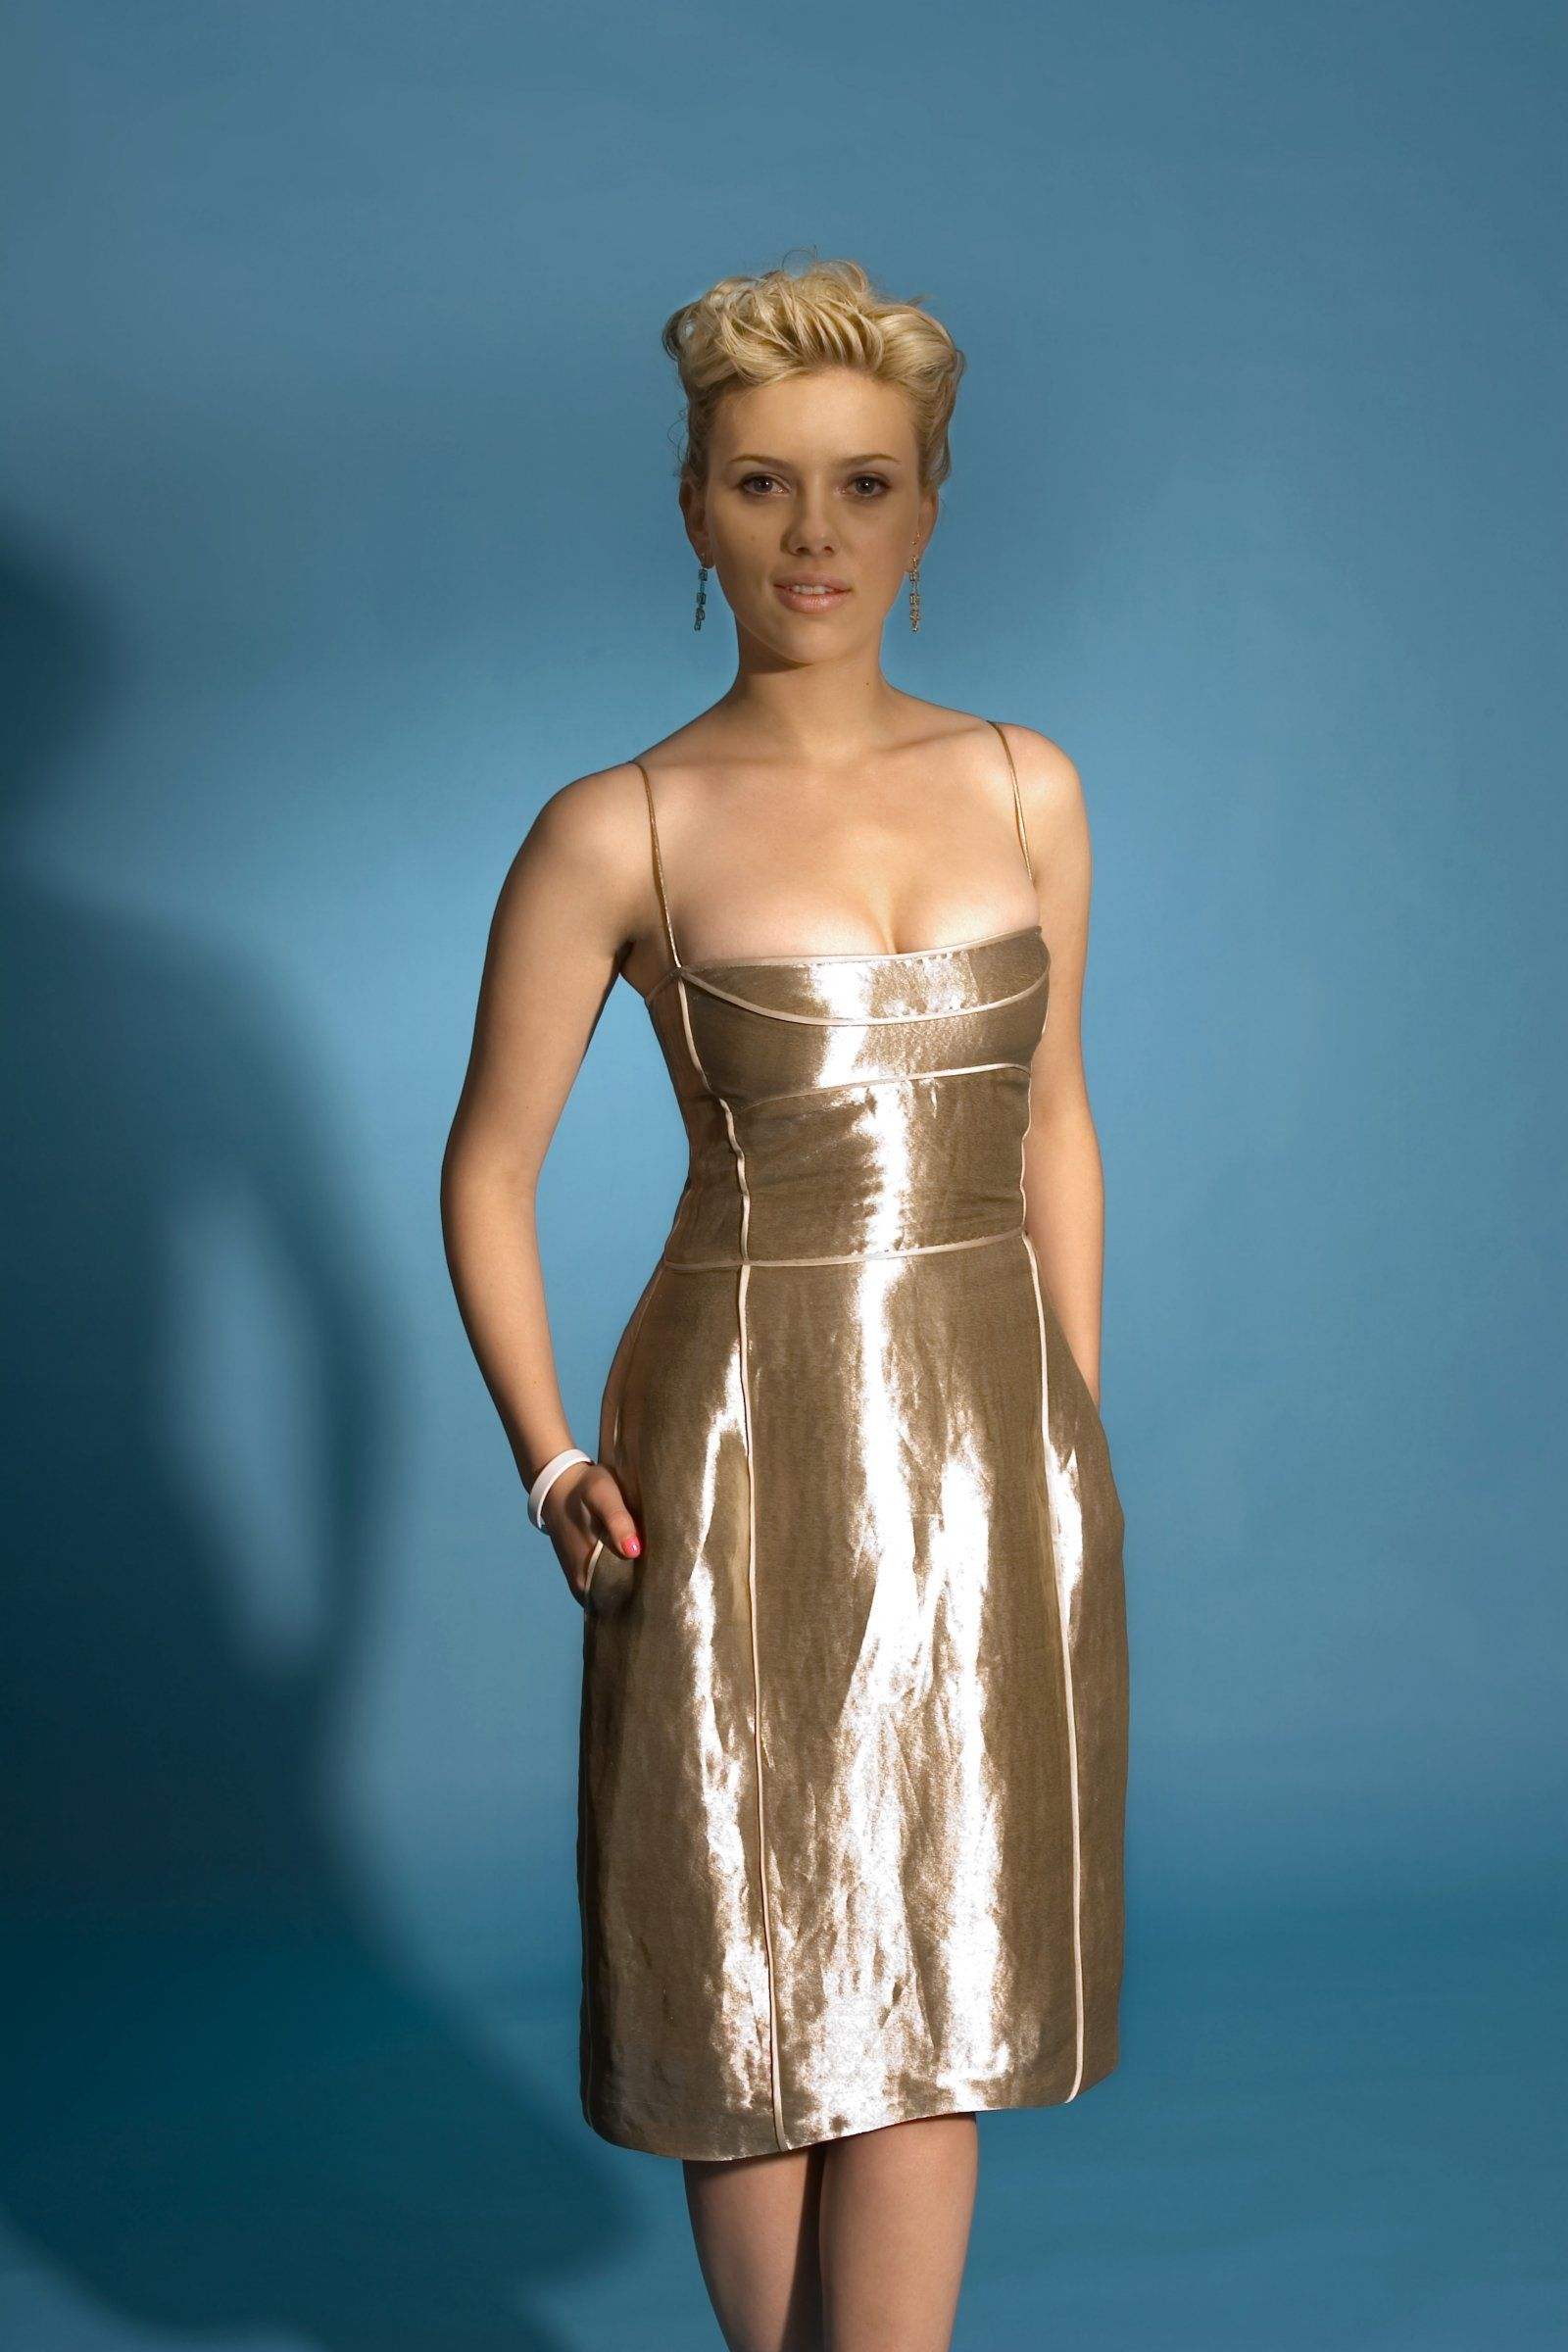 Scarlett Johansson | Scarlett Johansson | Pinterest | Scarlett ...